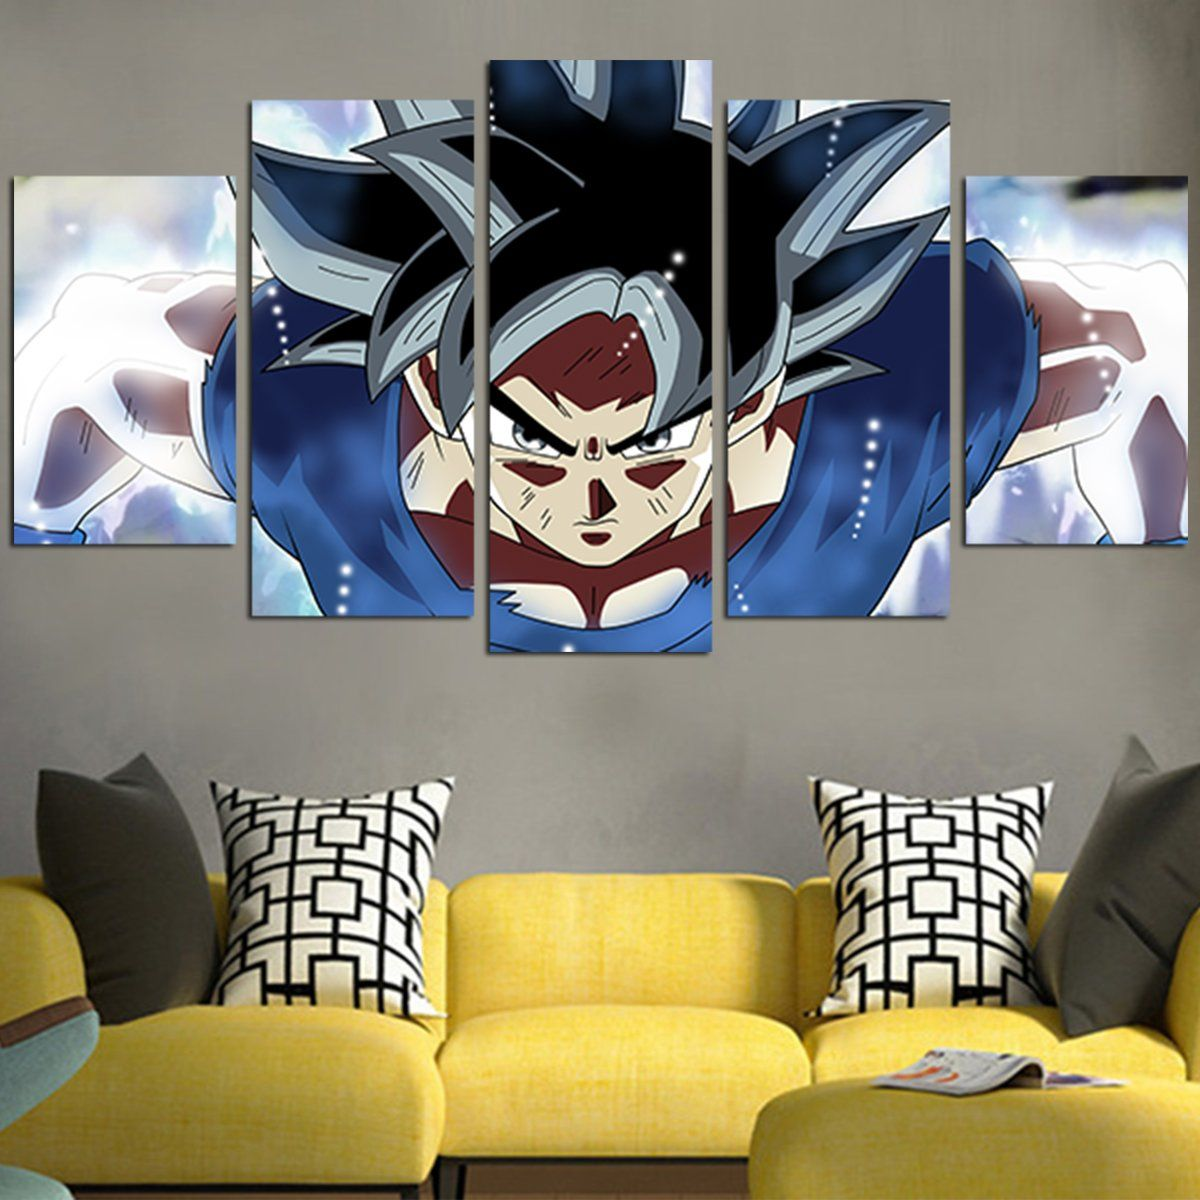 Super black goku dragon balls wall art canvas products dragon